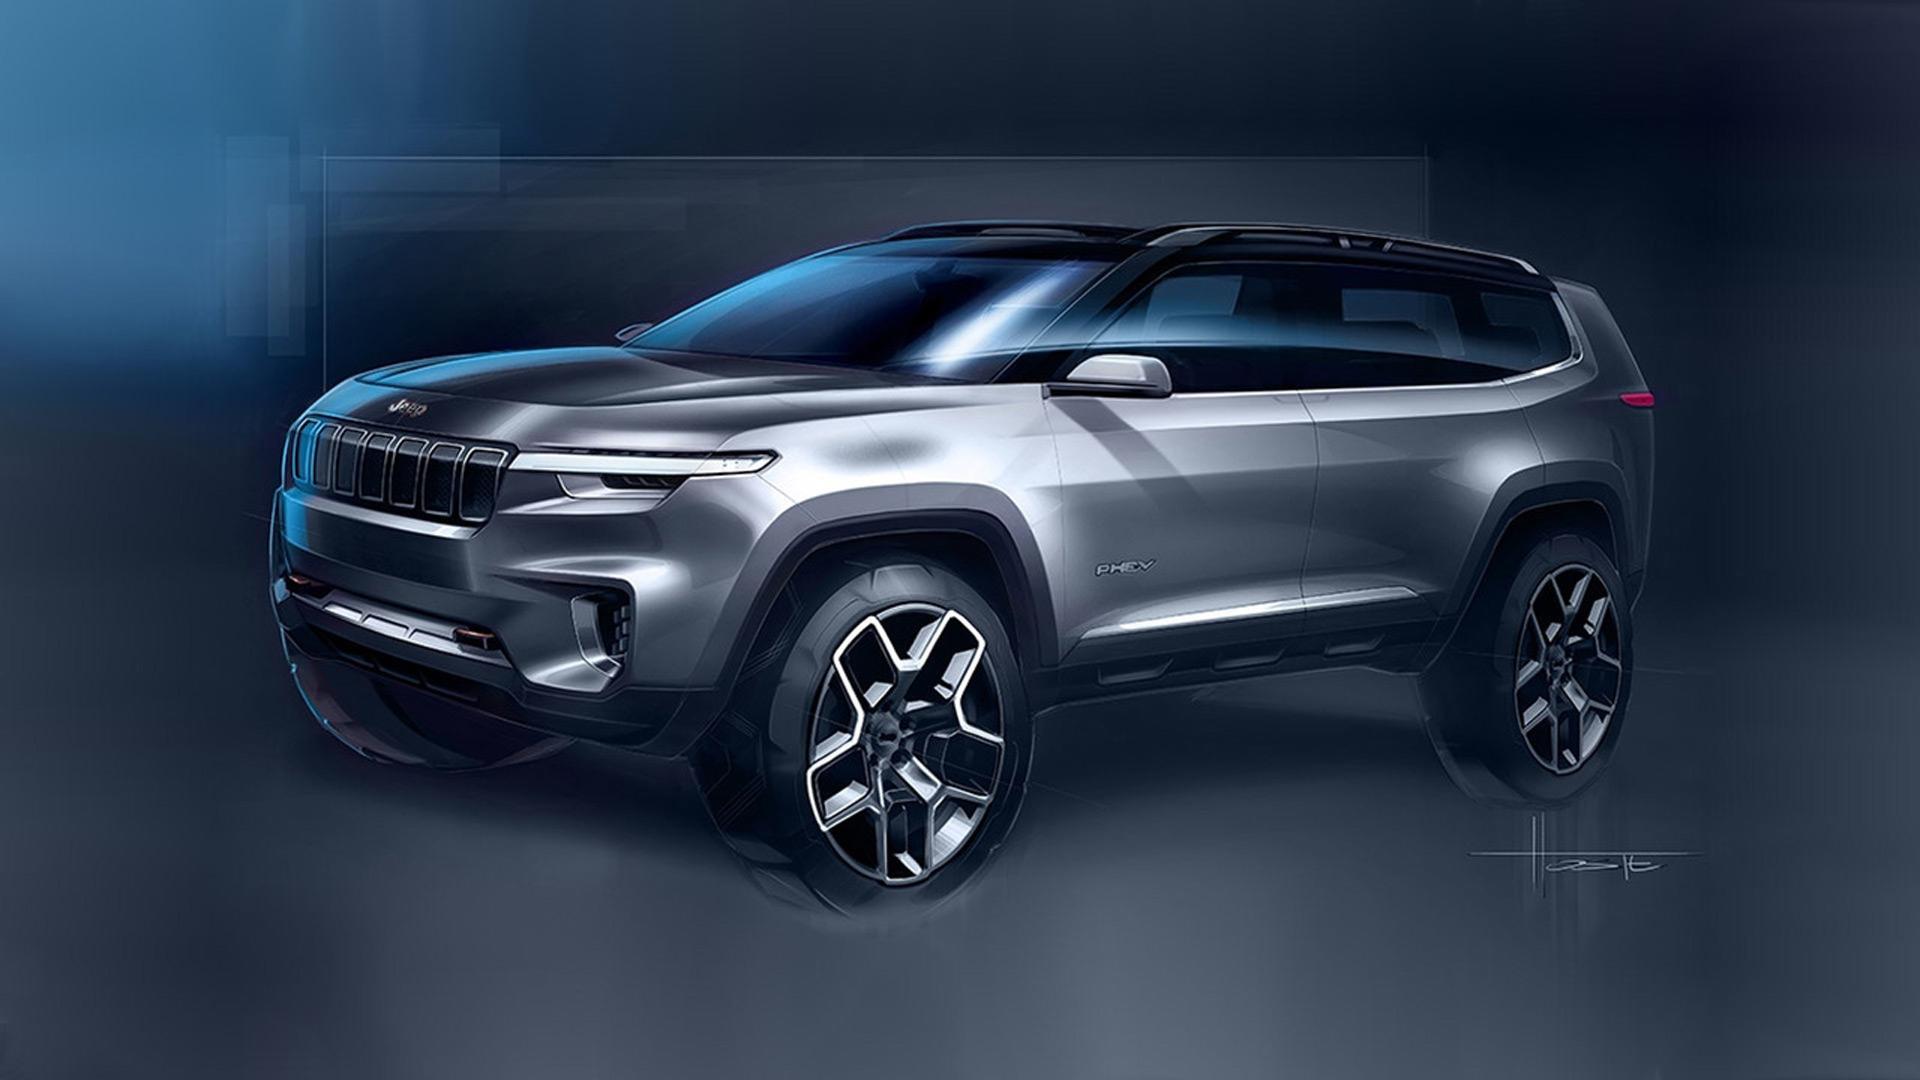 Jeep teases a hybrid concept for the 2017 Shanghai auto show